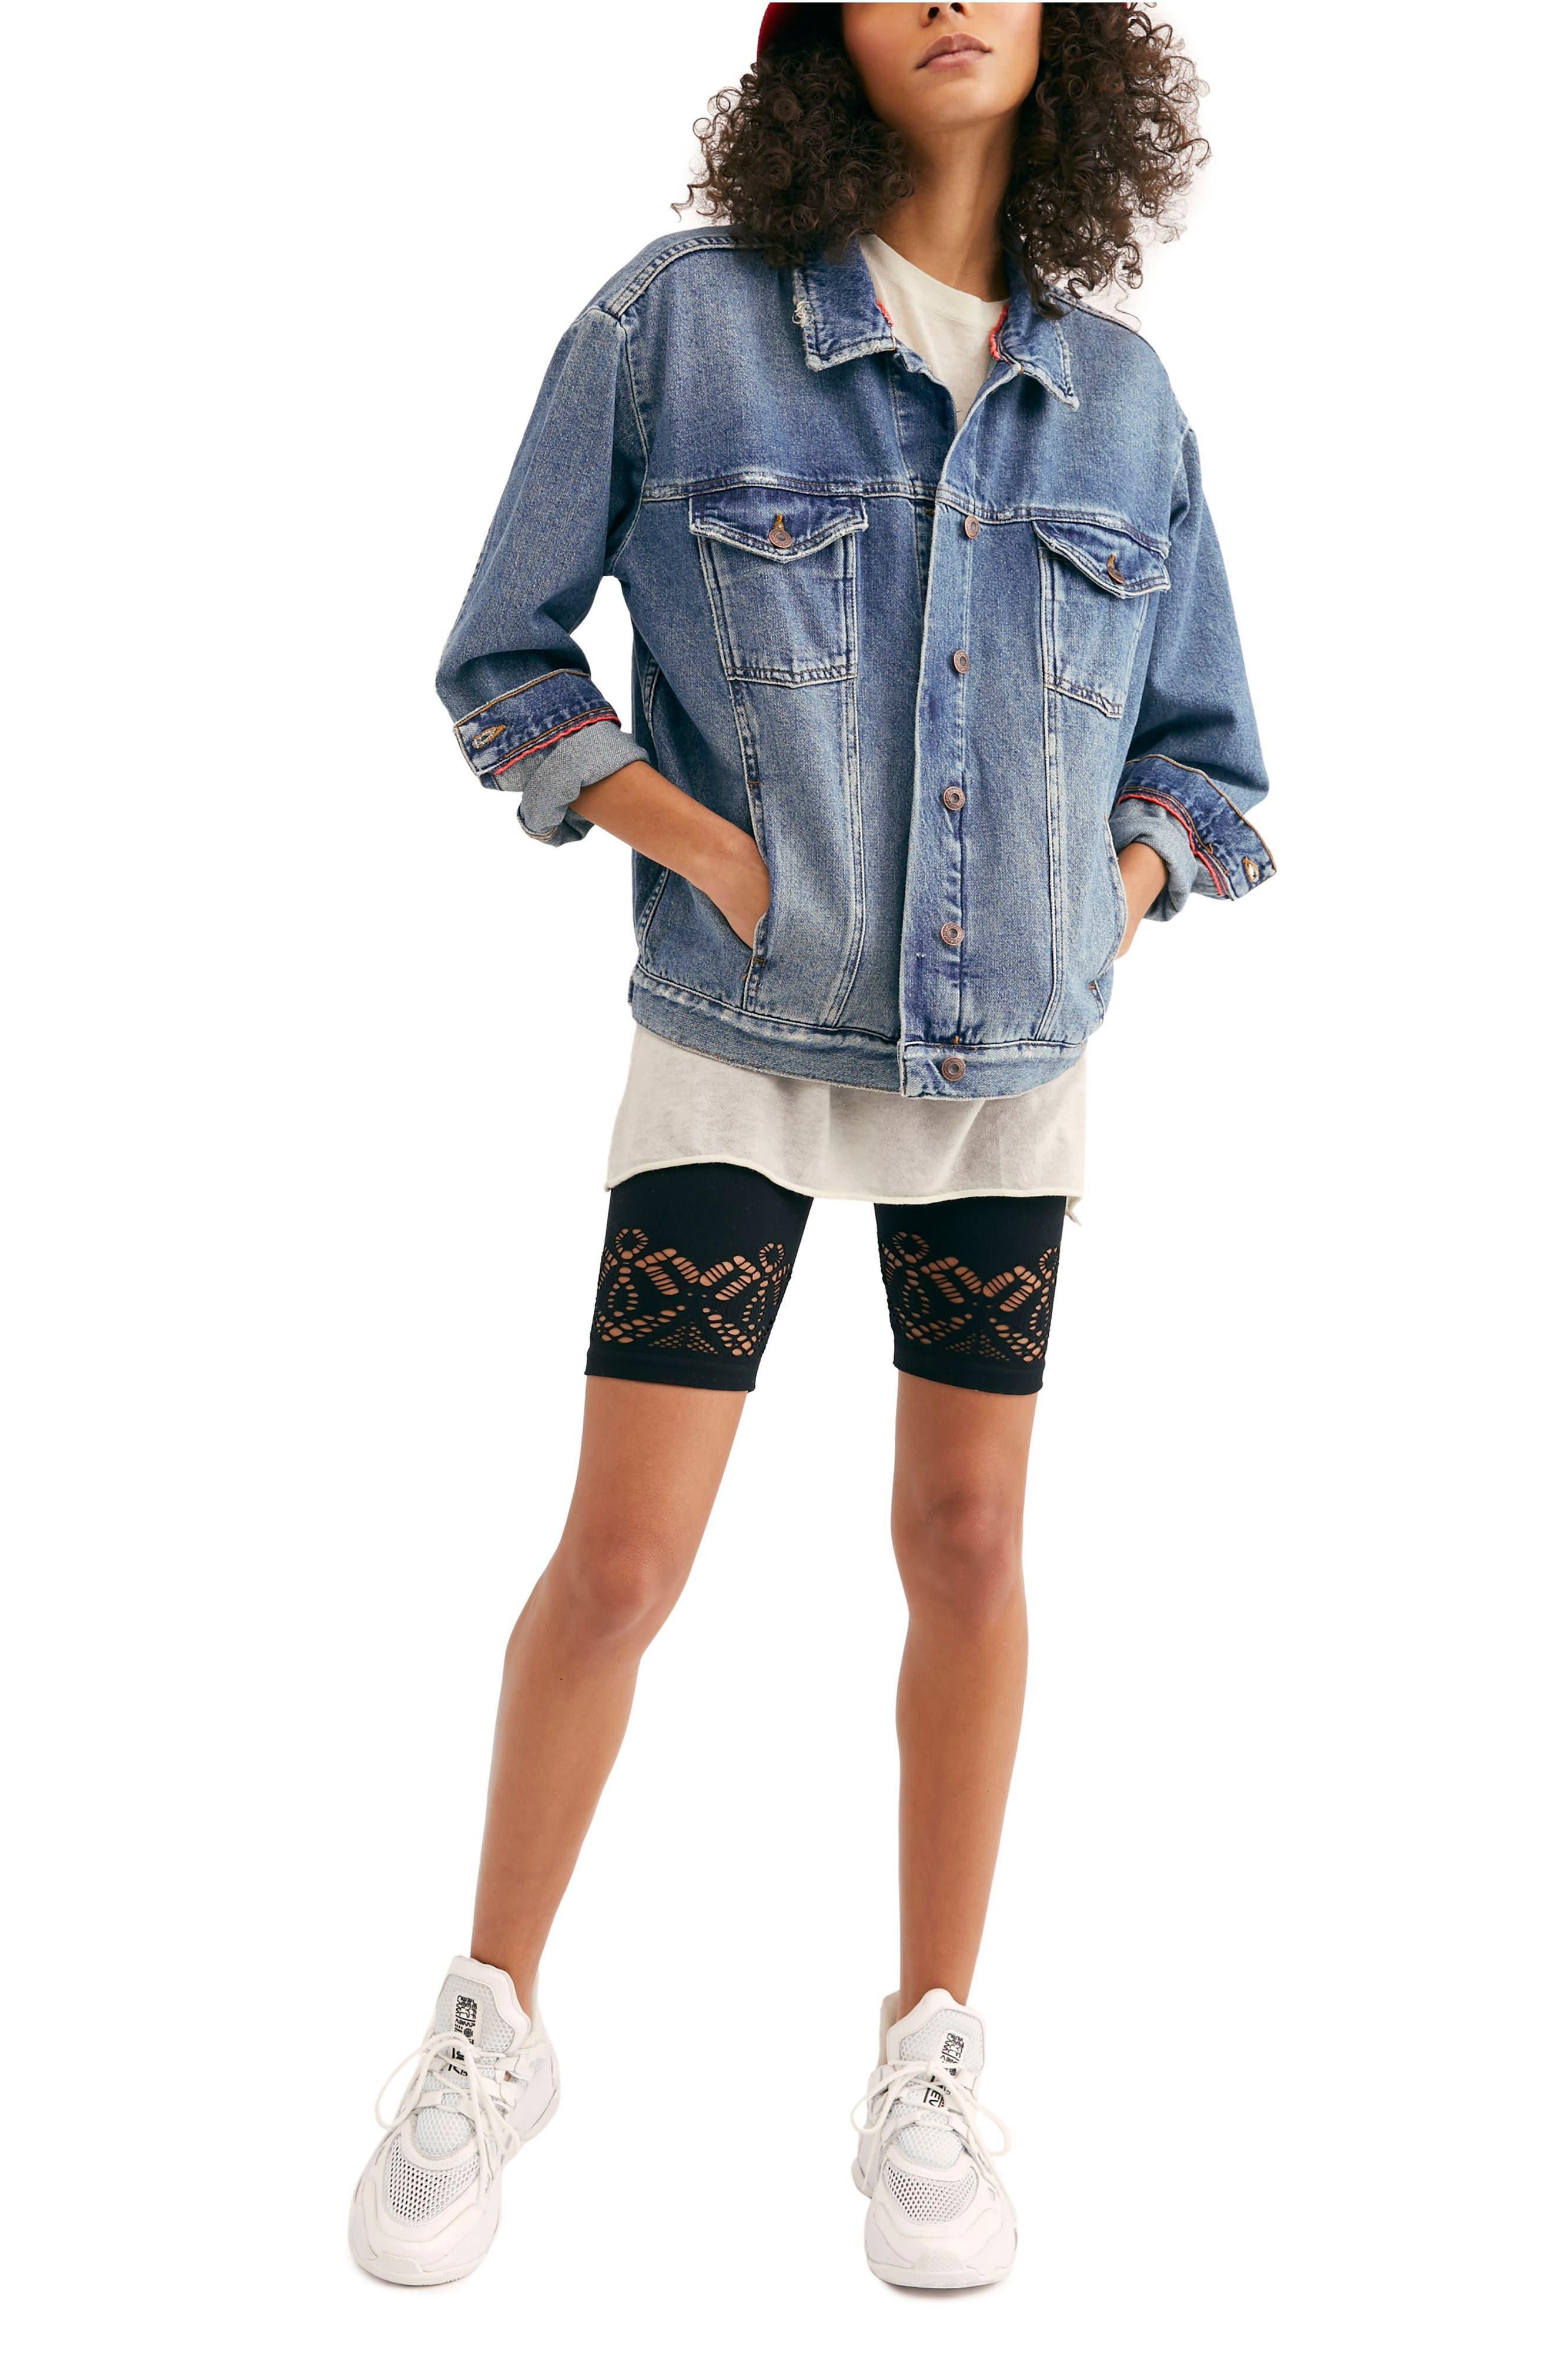 FREE PEOPLE, Ramona Denim Trucker Jacket, Alternate thumbnail 7, color, INDIGO BLUE